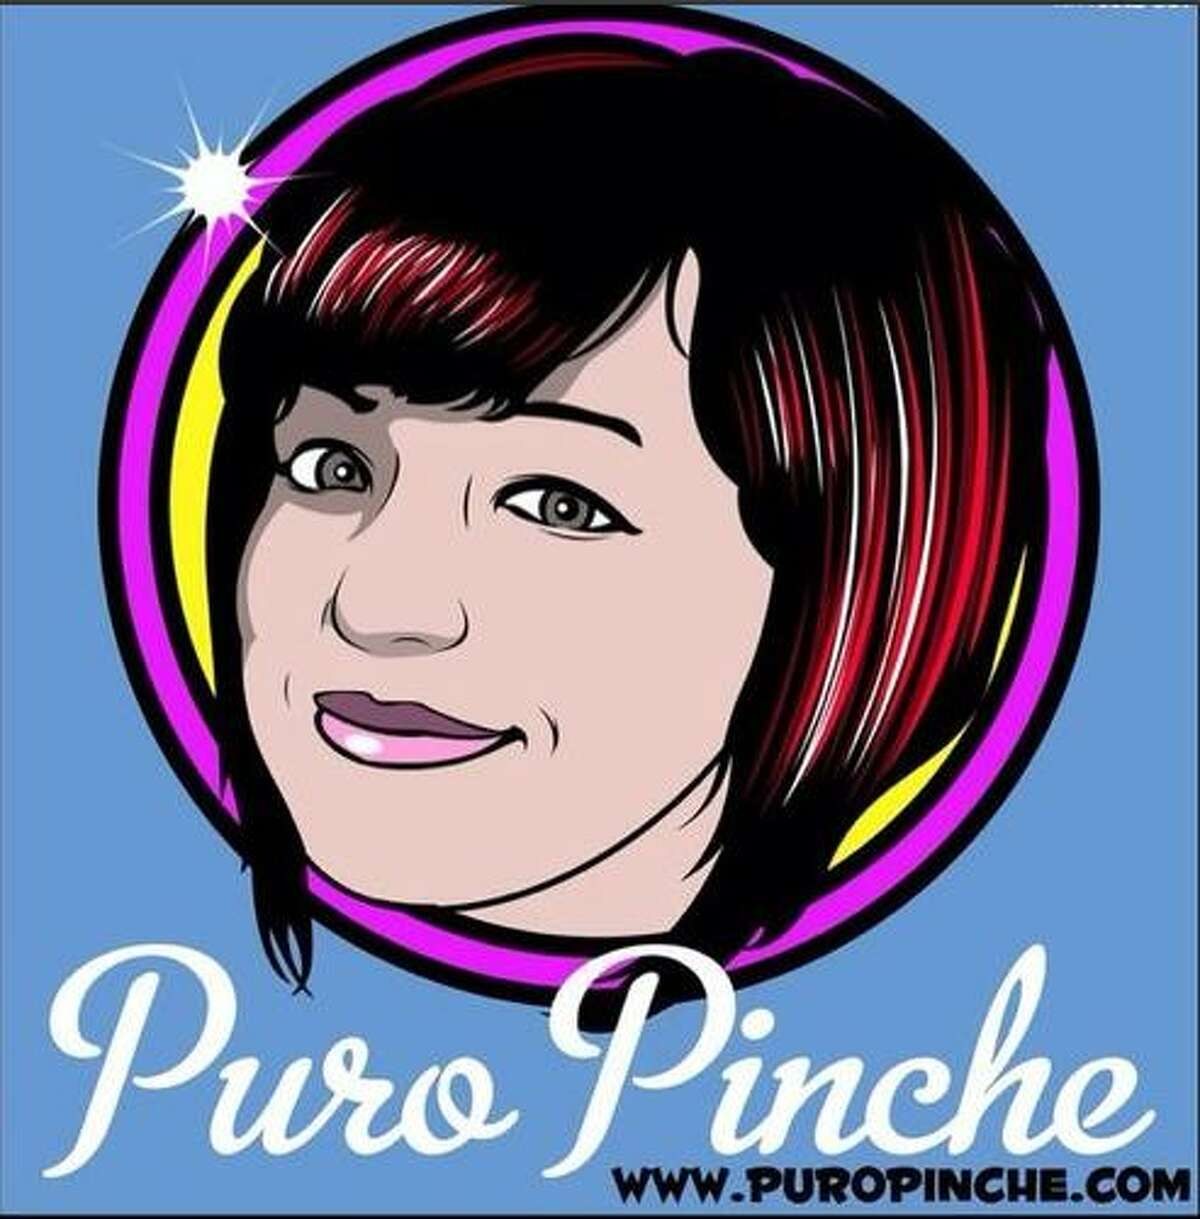 1. @PuroPincheSA Followers: 5,611 Bio: